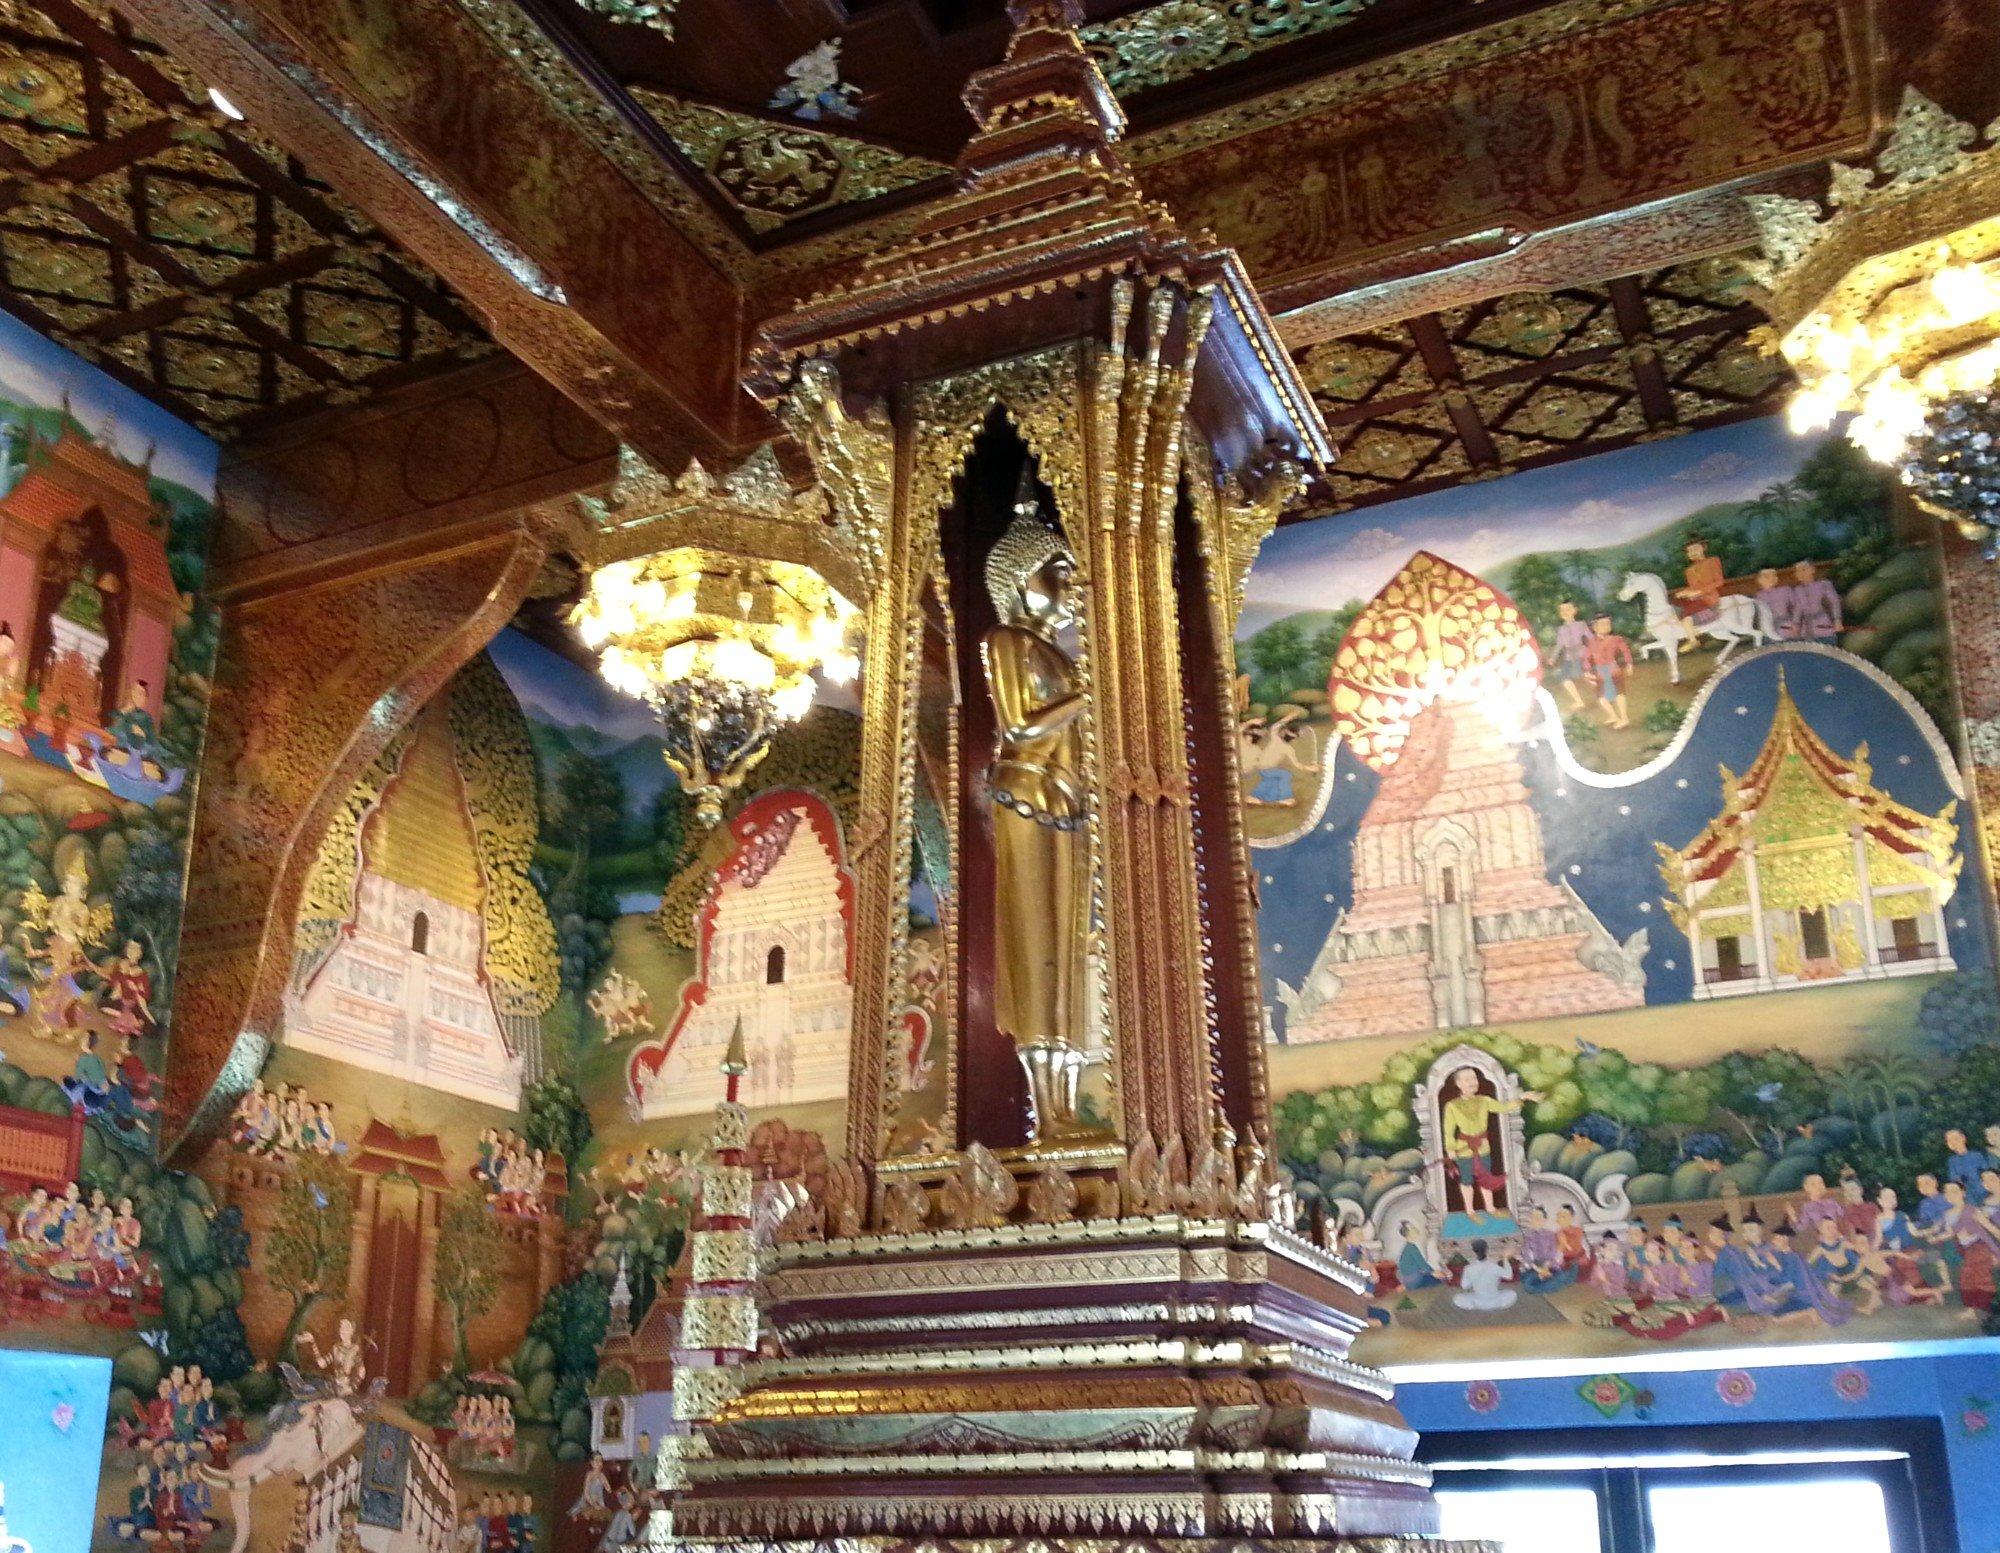 Inside Chiang Mai's City Pillar Shrine